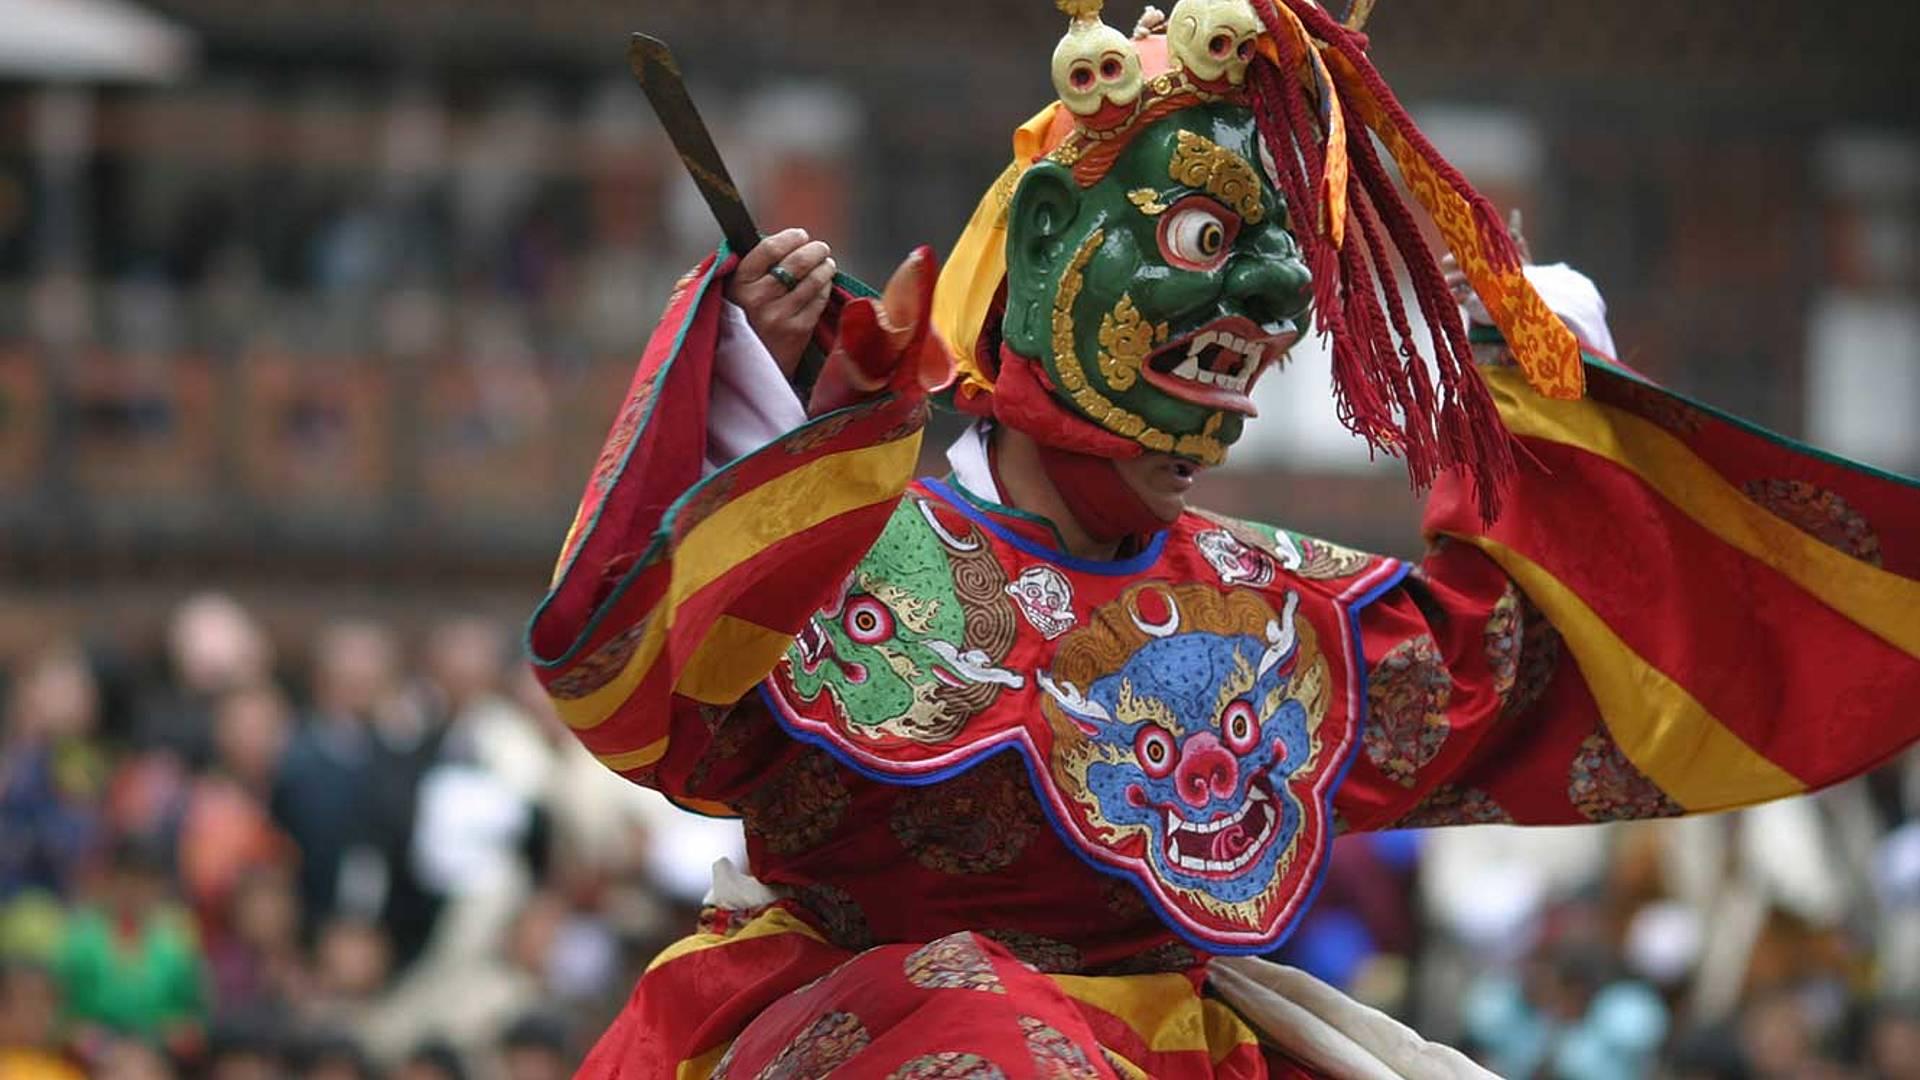 Nepal e Bhutan per il festival Tshechu di Thimphu